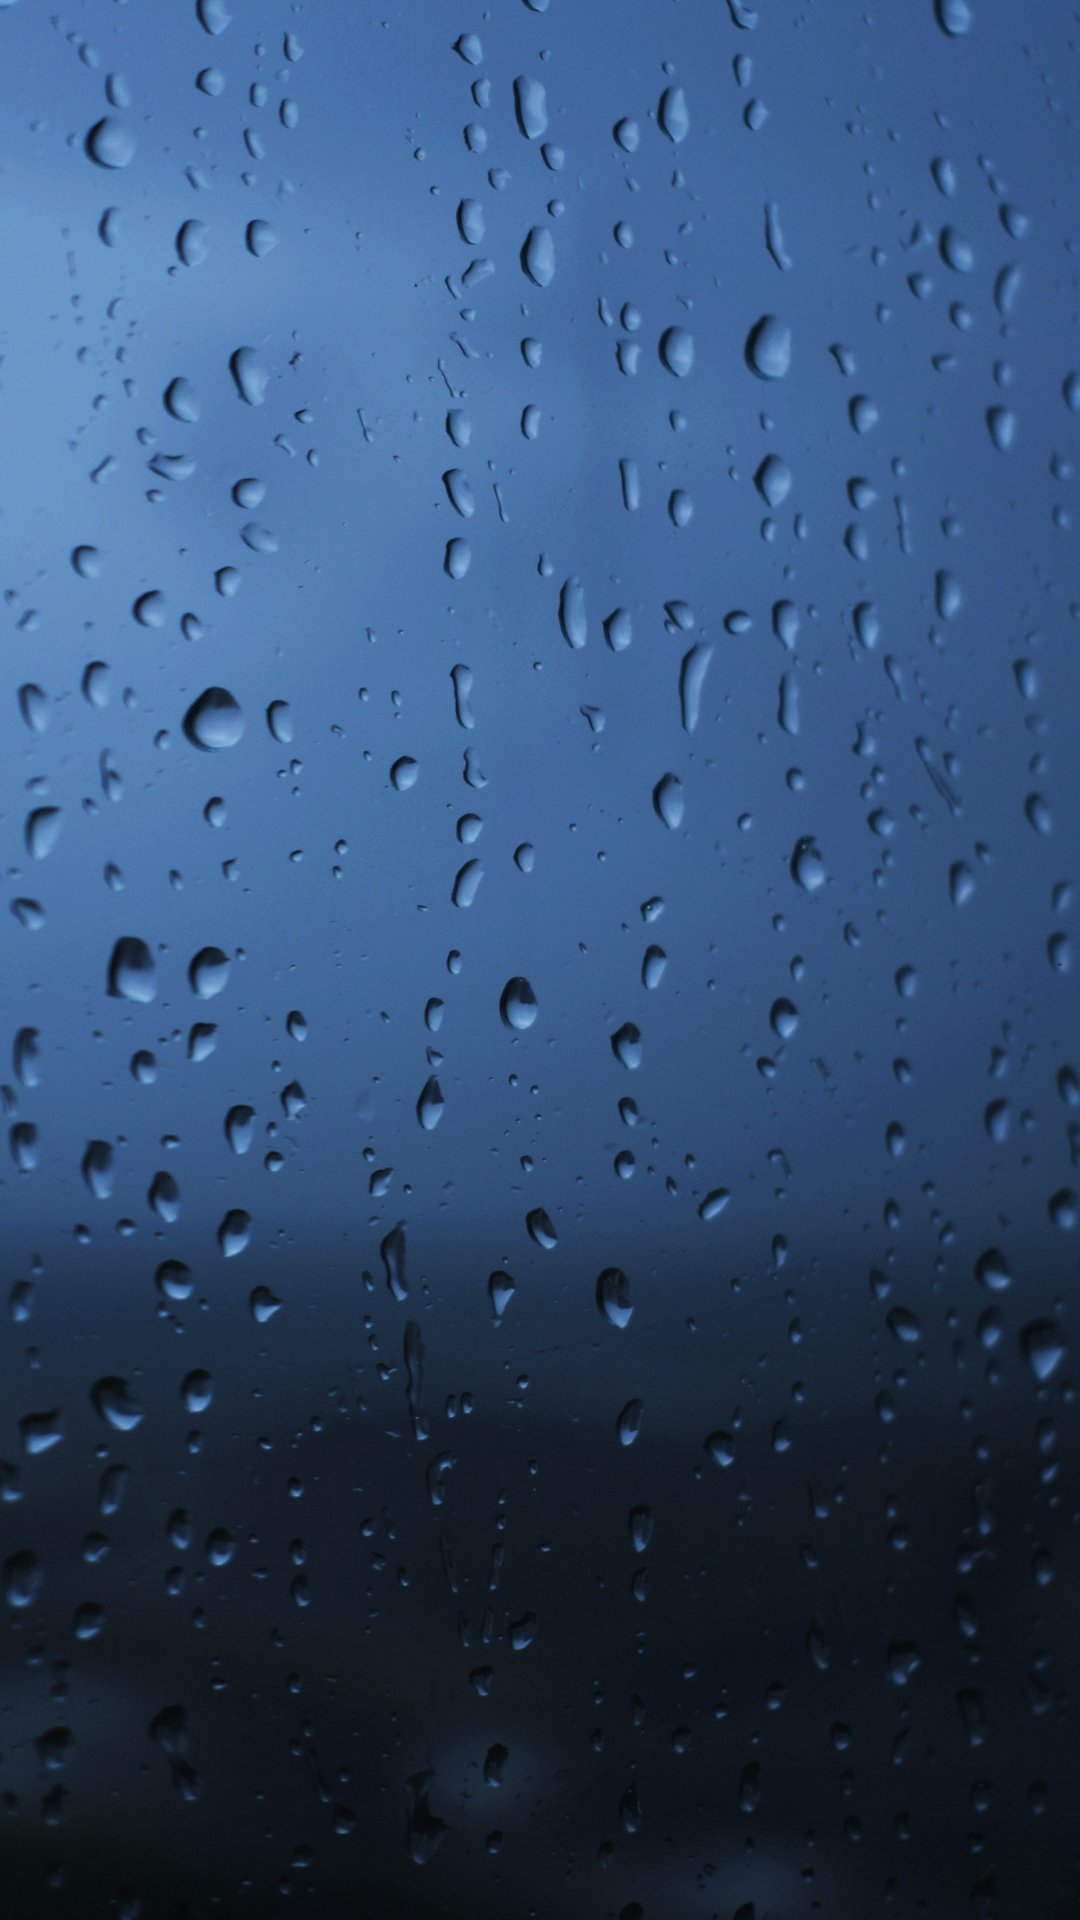 Rain phone wallpaper hd